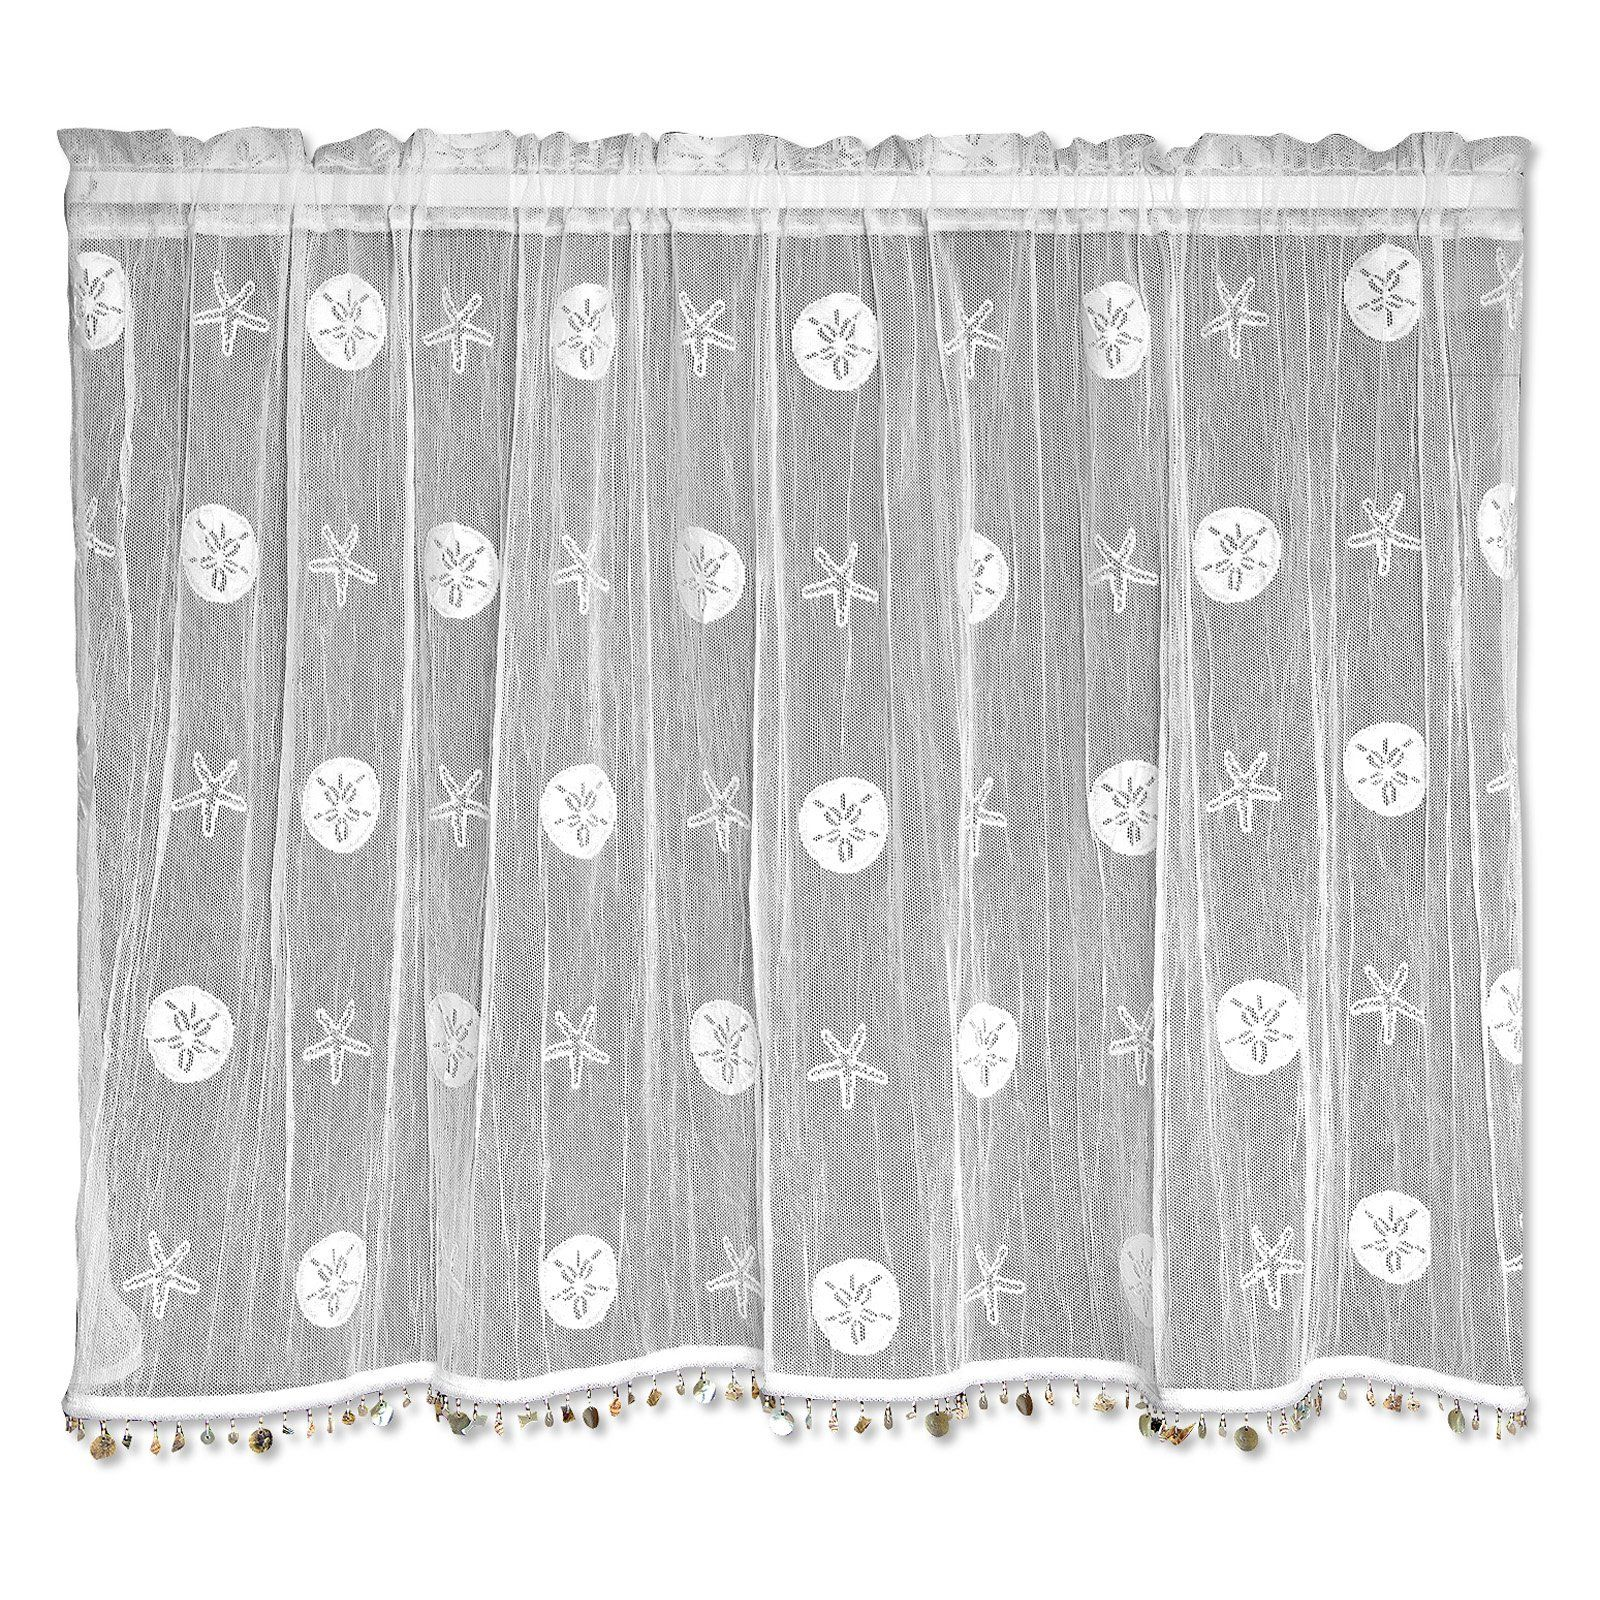 Heritage Lace Sand Dollar Curtain Tier